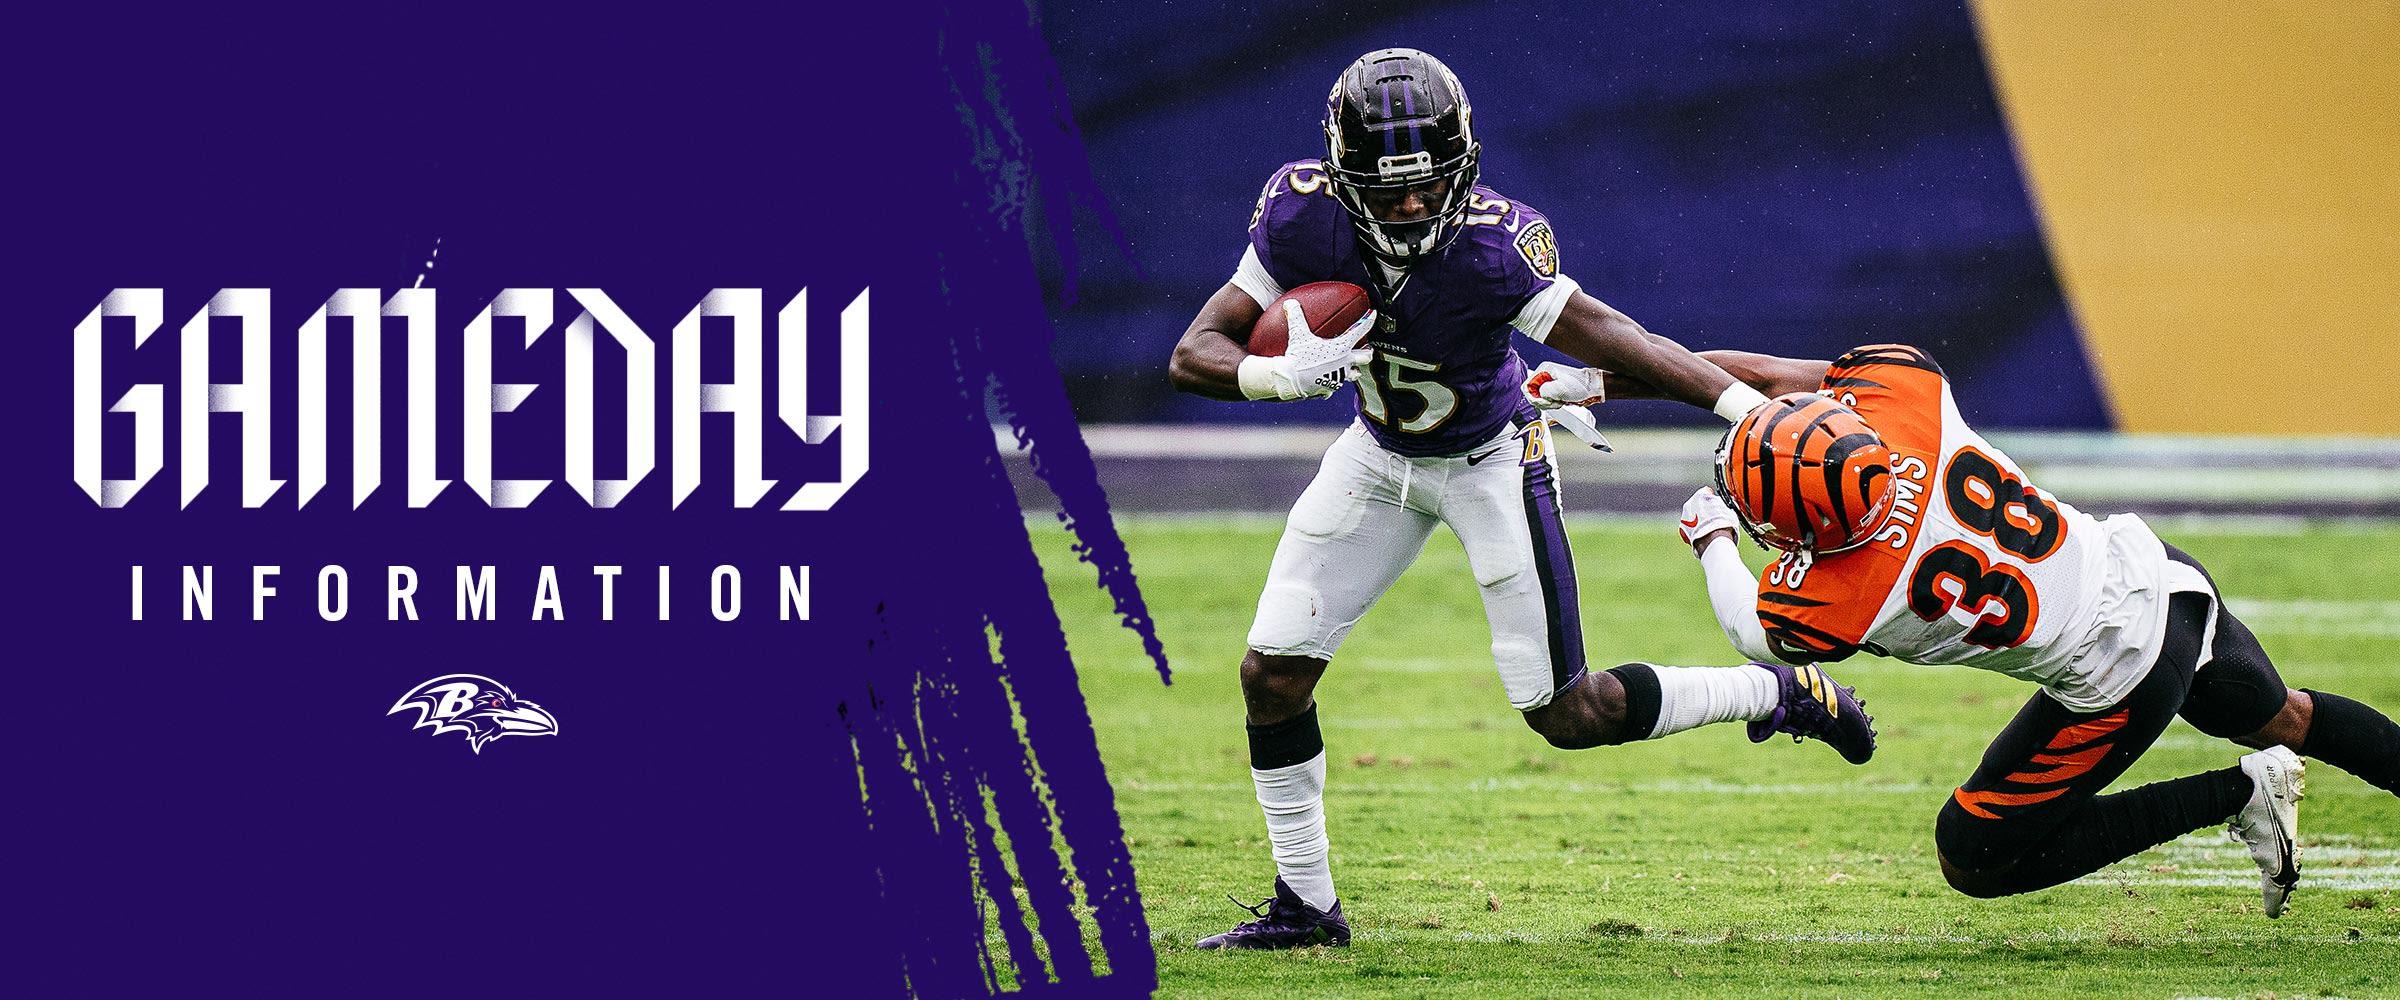 Ravens Gameday | Baltimore Ravens – baltimoreravens.com